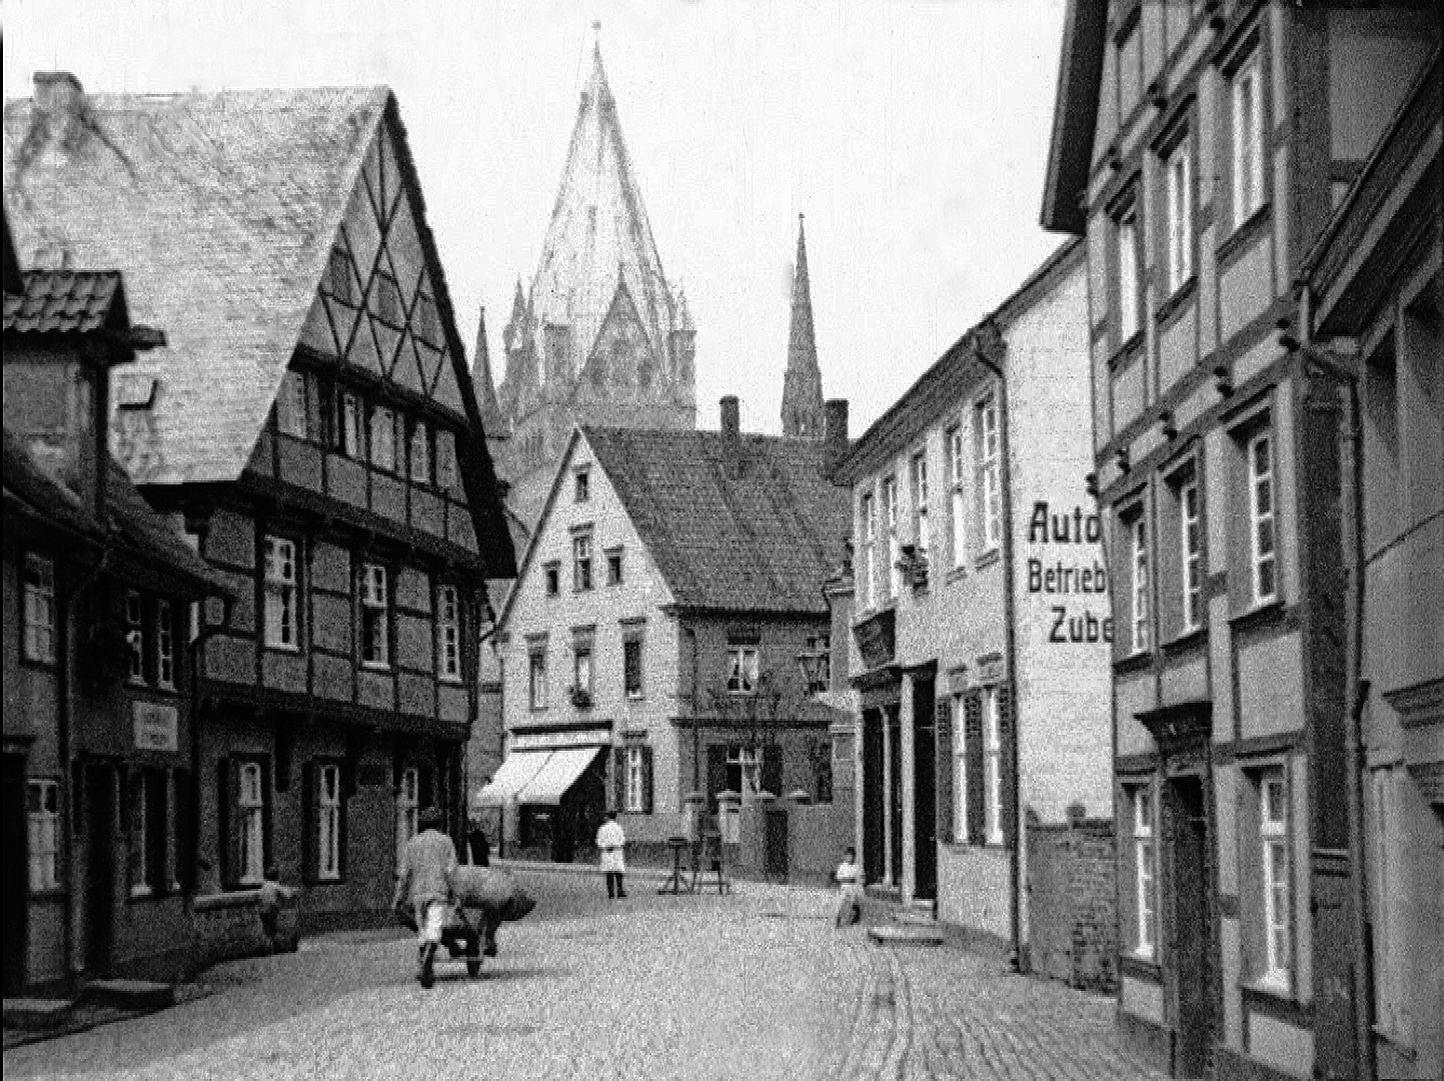 Die Soester Innenstadt mit Blick auf St. Patrokli, ca. 1926. Repro: LWL